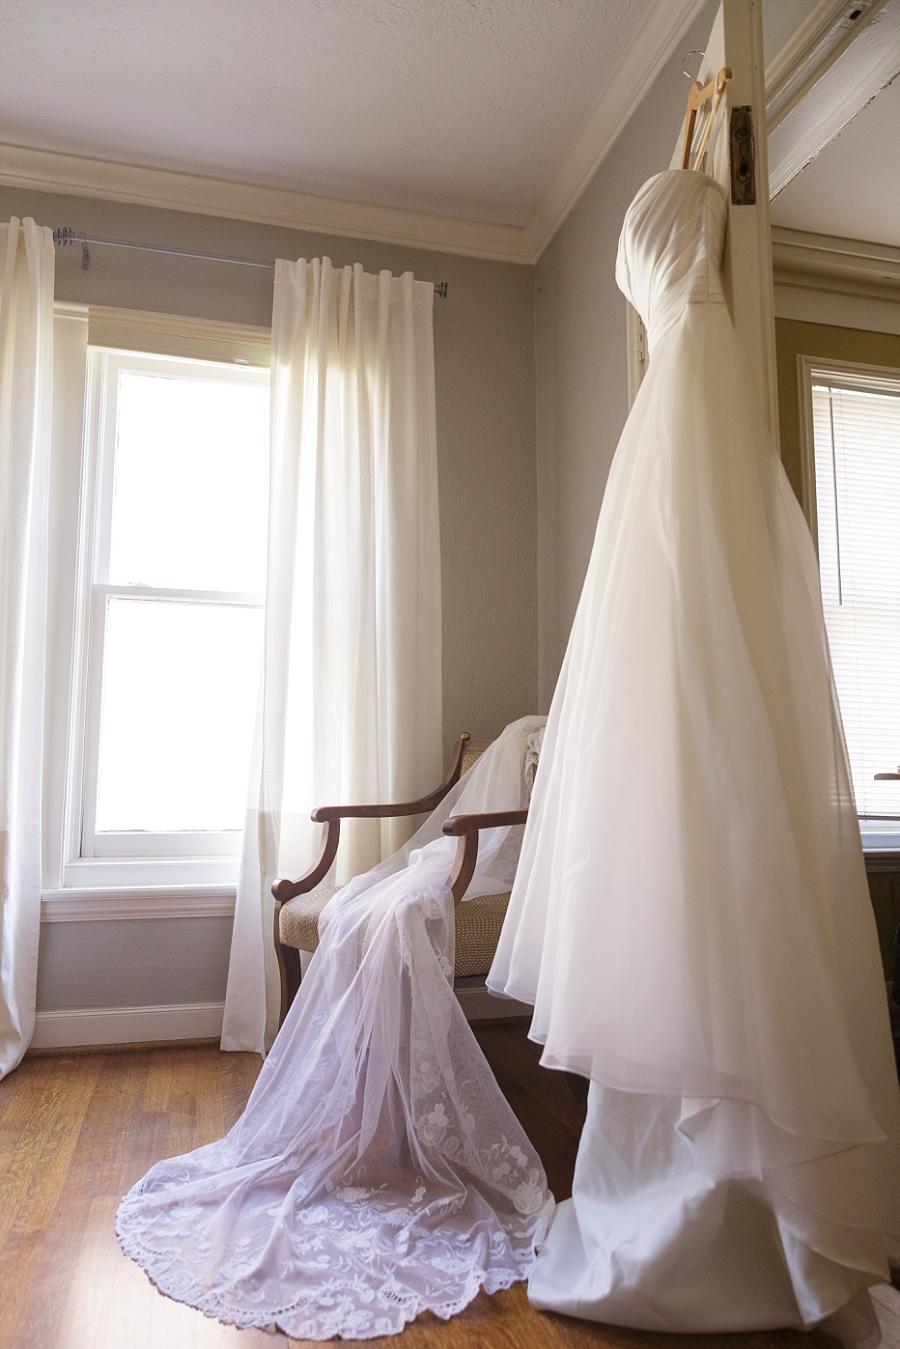 Stacy-Anderson-Photography-McGovern-Centennial-Gardens-Houston-Wedding-Photographer_0003.jpg